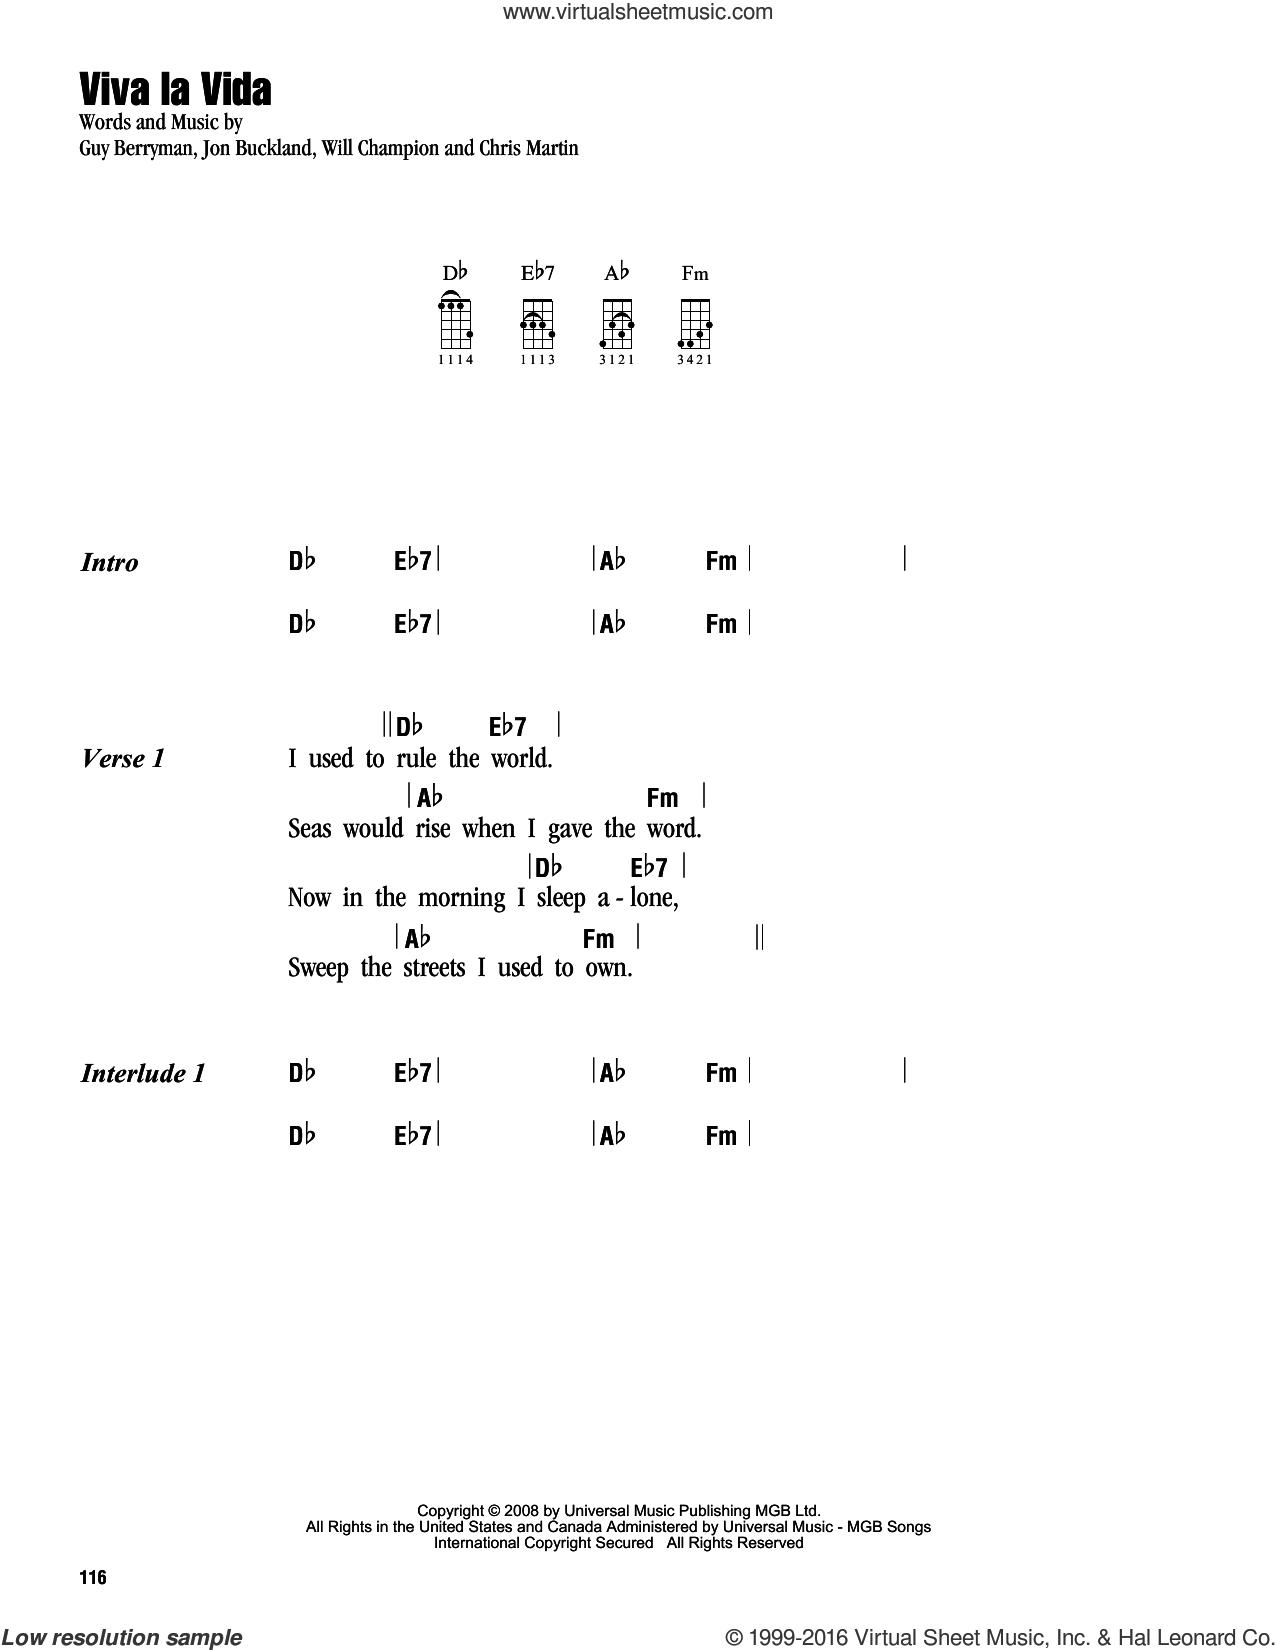 Viva La Vida sheet music for ukulele (chords) by Guy Berryman, Coldplay, Chris Martin, Jon Buckland and Will Champion, intermediate skill level